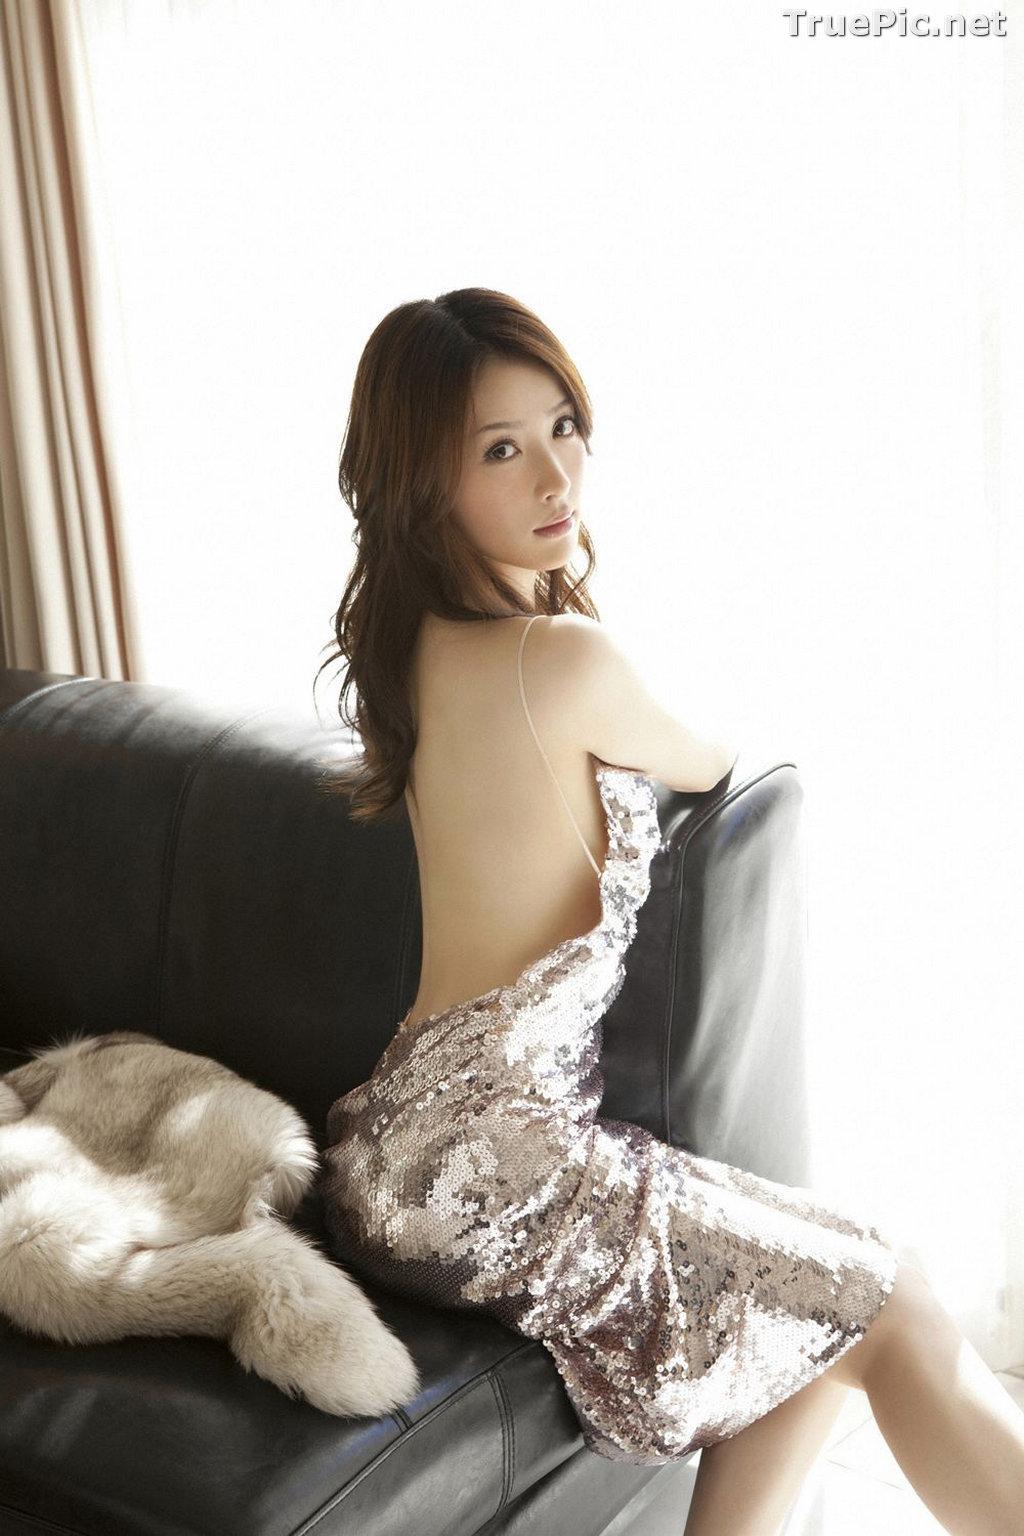 Image [YS Web] Vol.340 - Japanese Model and Actress - Saki Seto - TruePic.net - Picture-2